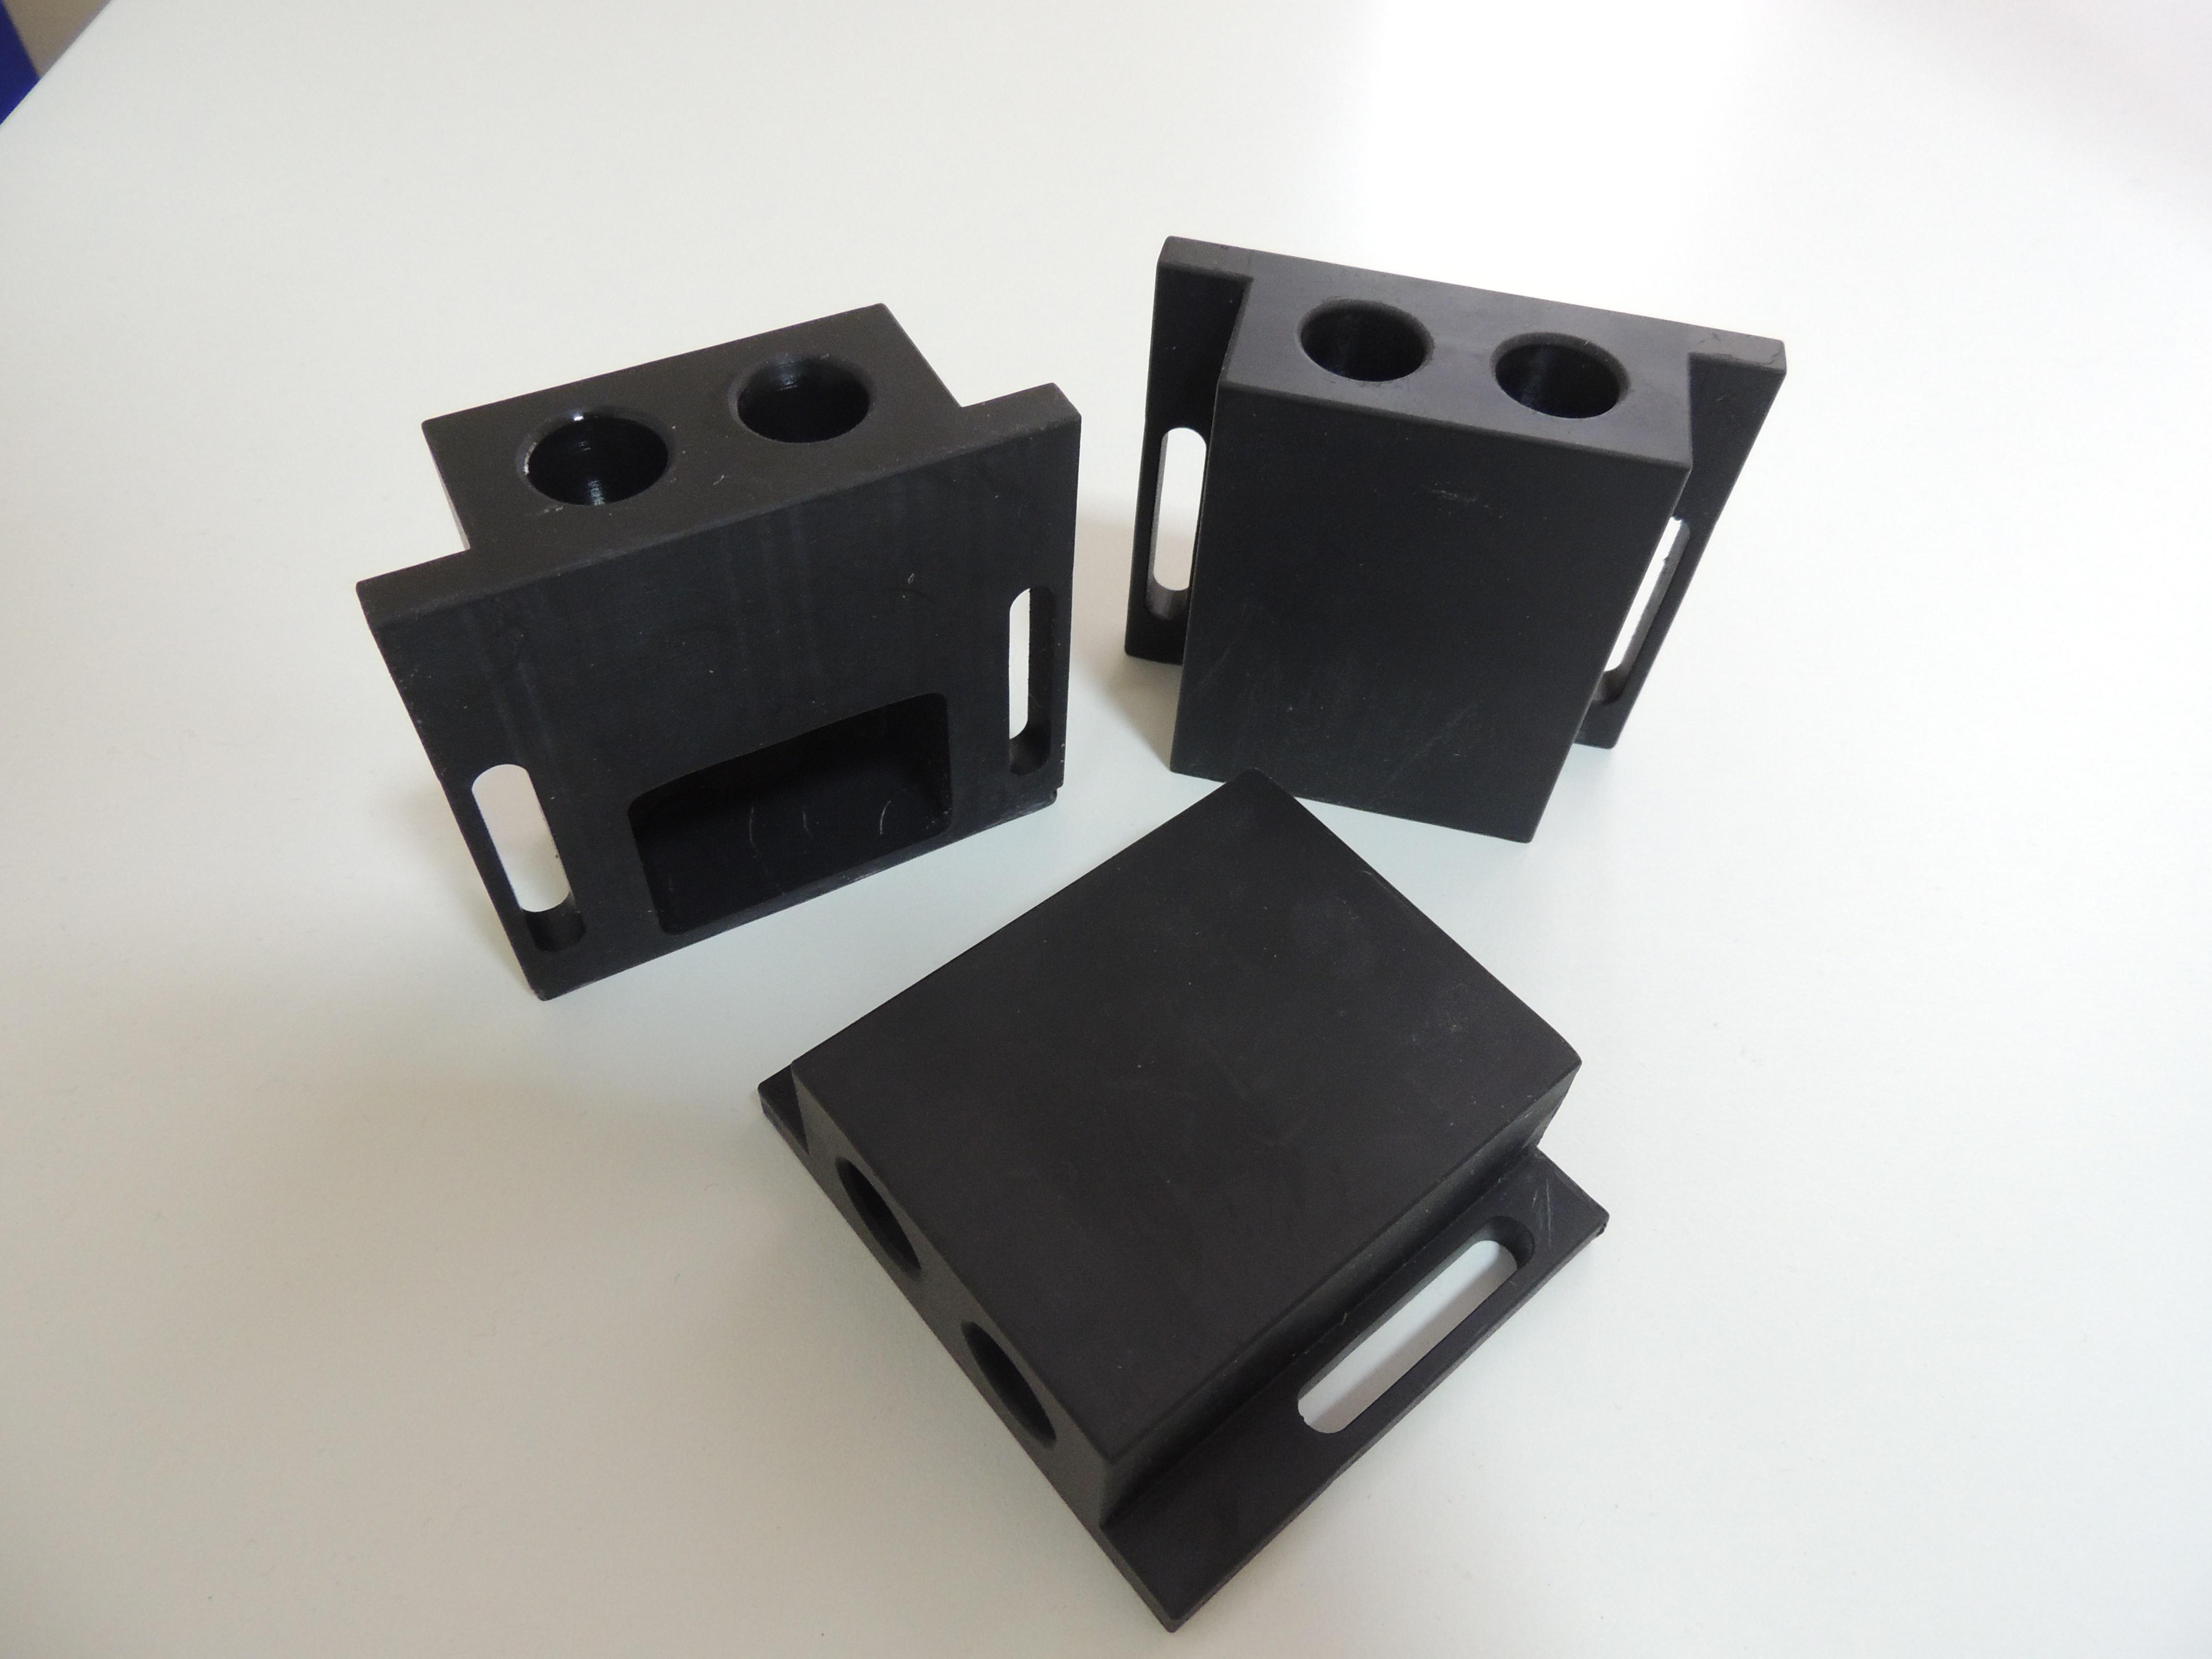 3D Printing Limburg | https://www.3dprintinglimburg.nl/files/afbeeldingen/portfolio/AfsluitschuifCropped.jpg